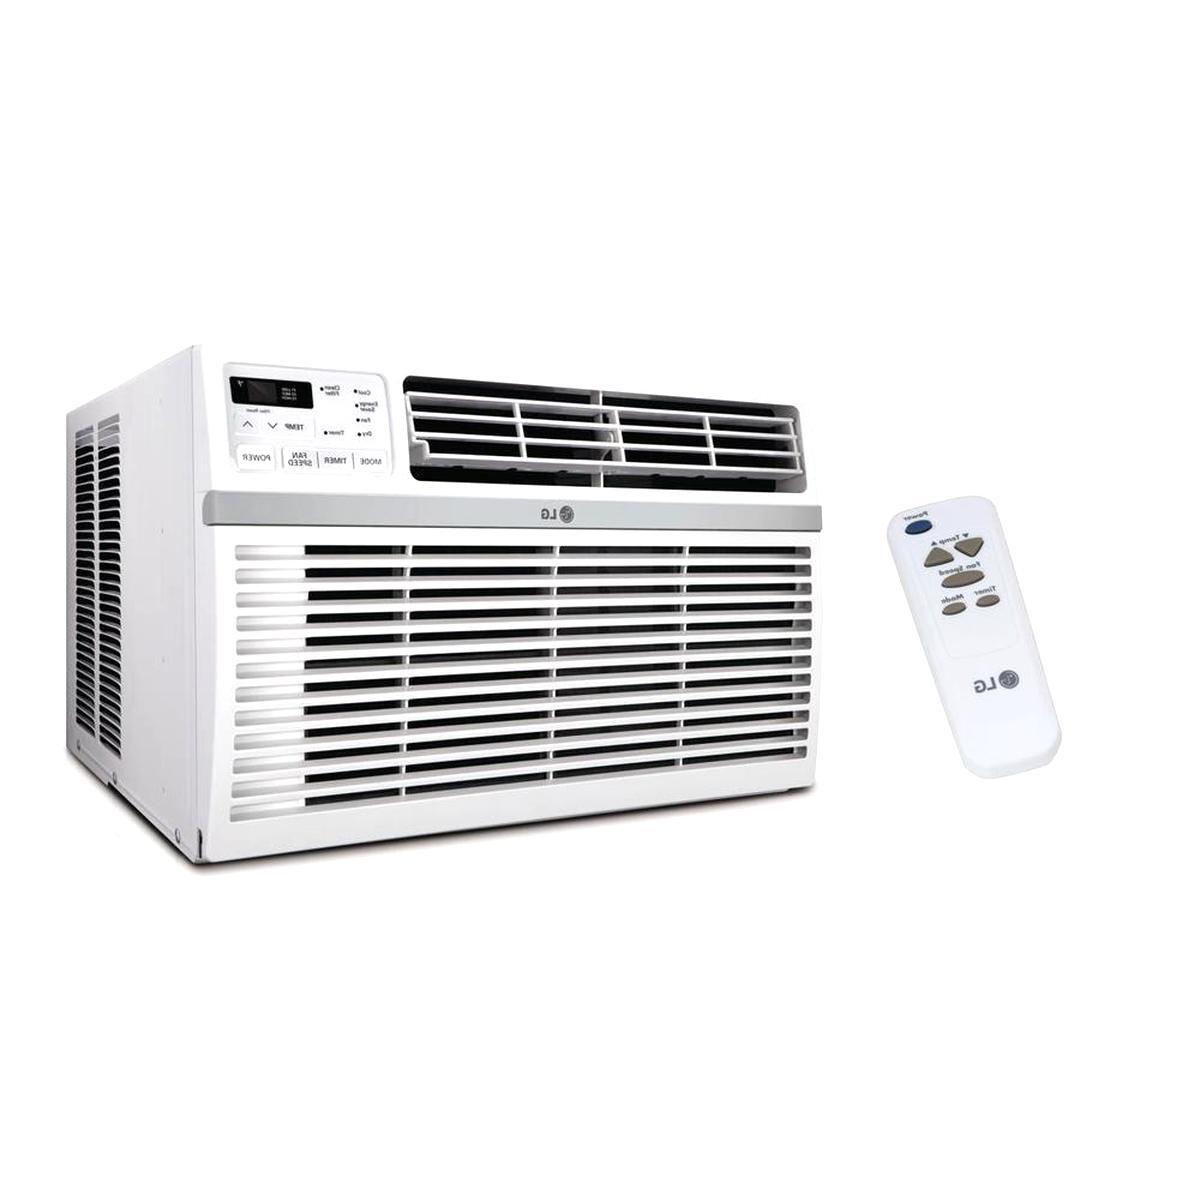 10000 btu air conditioner for sale